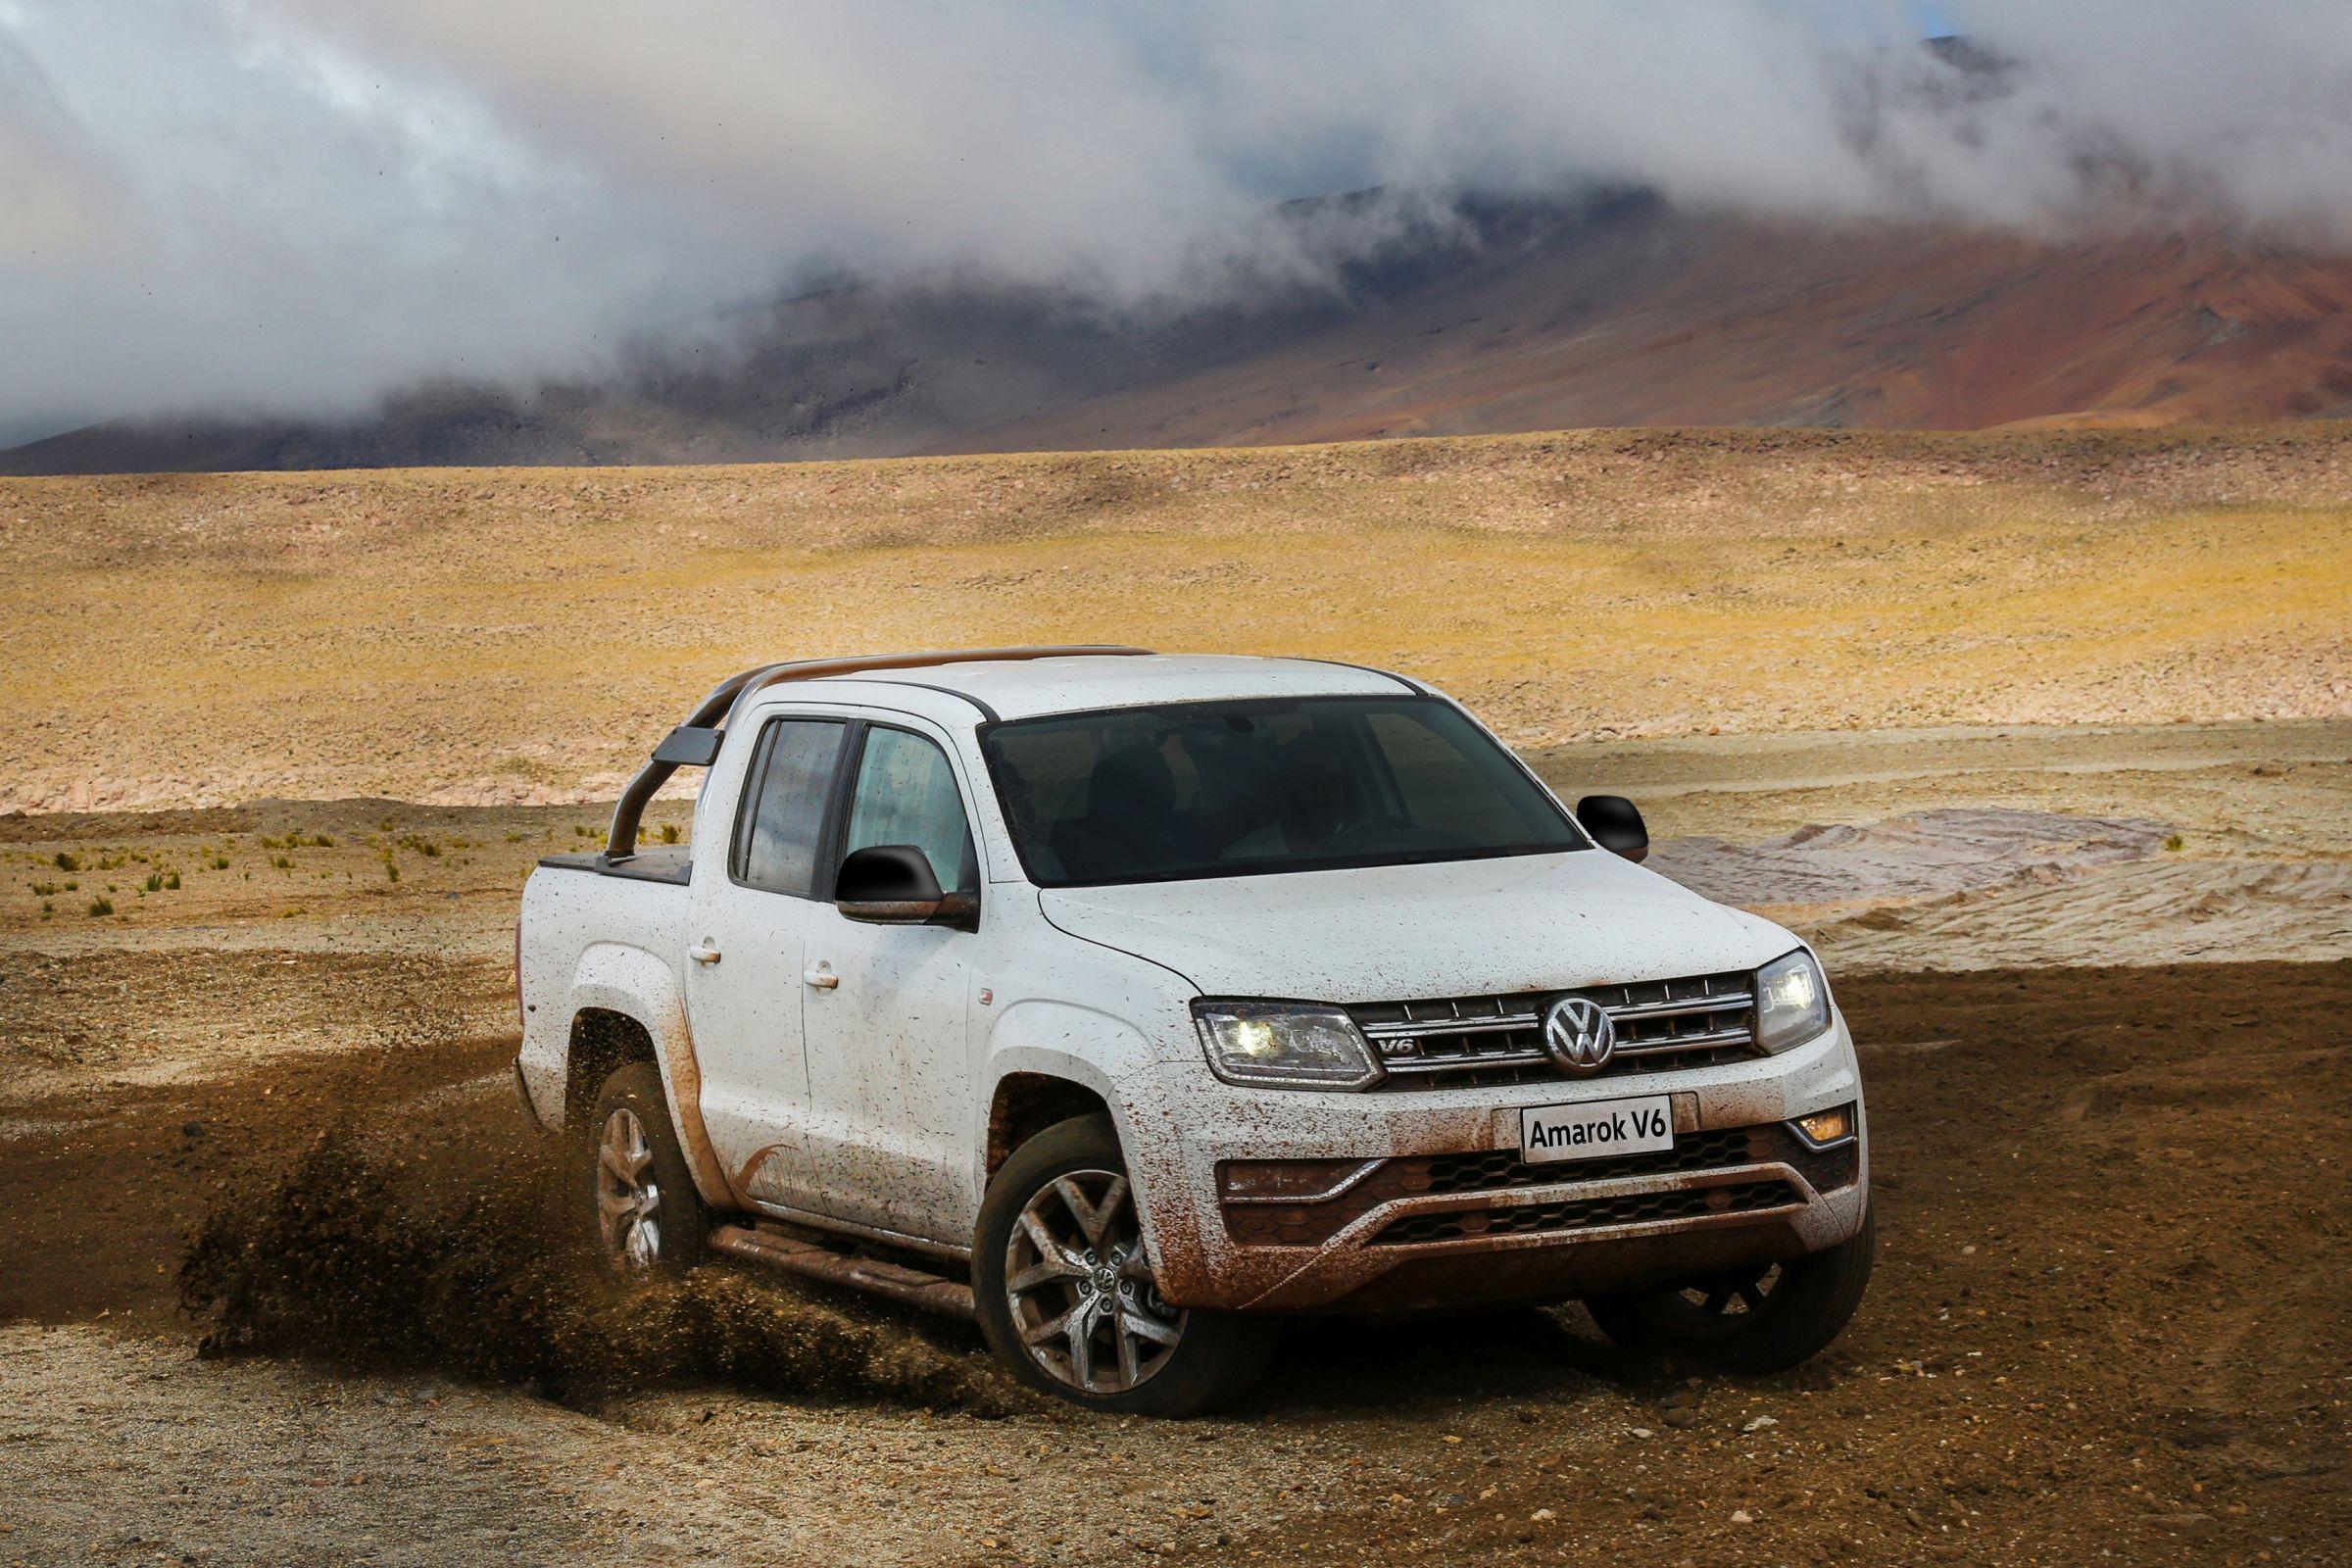 Recall da Volkswagen convoca a picape Amarok; saiba se seu veículo foi chamado